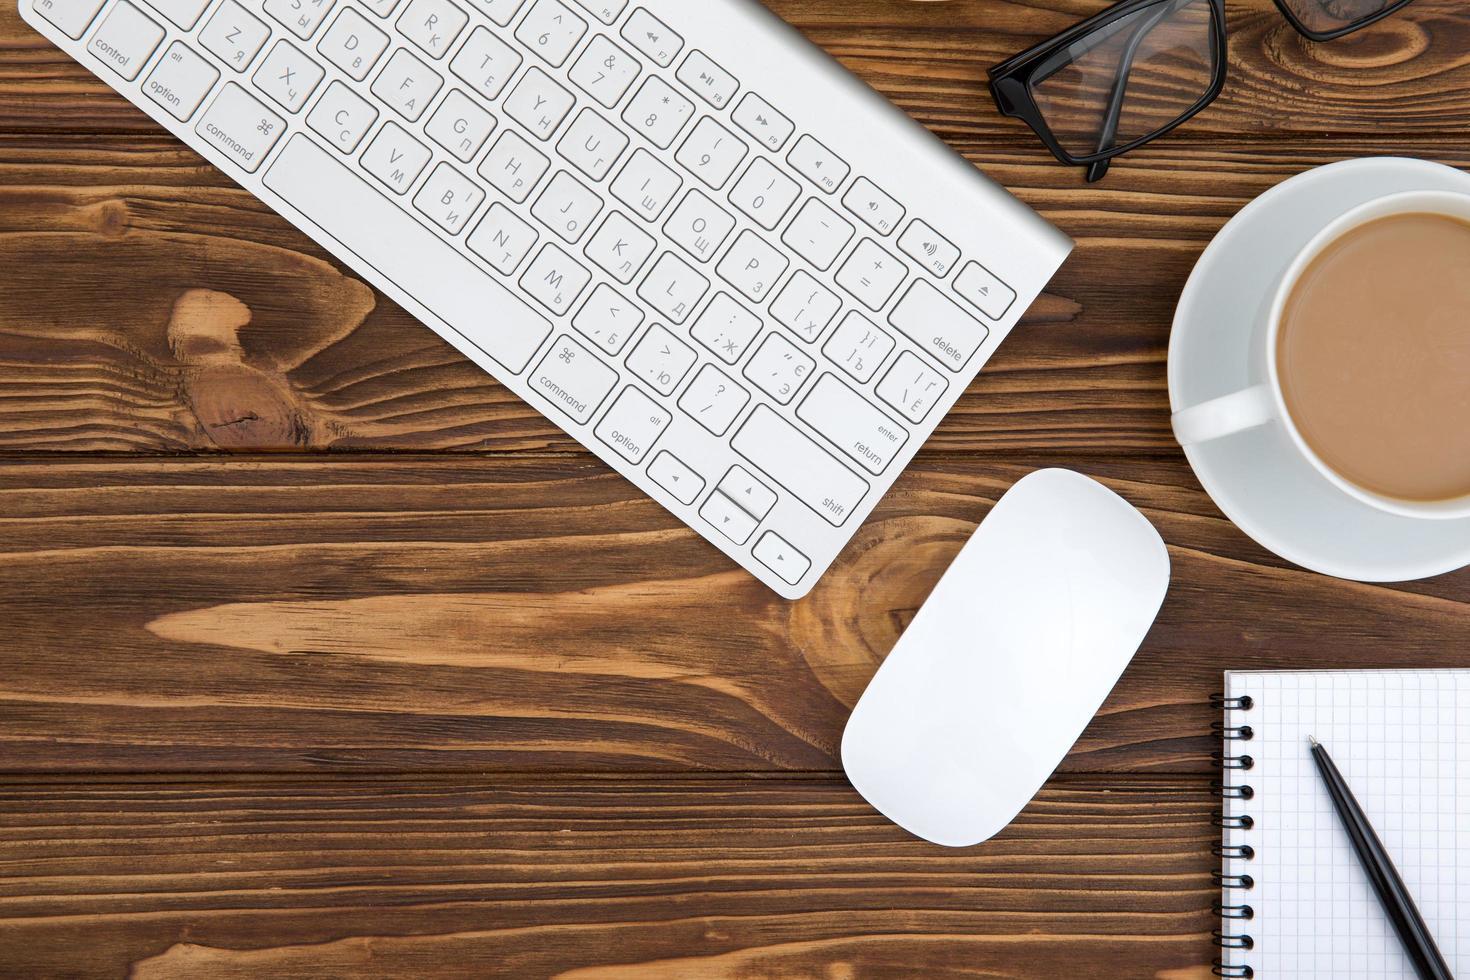 bureau houten tafel van zakelijke werkplek en zakelijke objecten foto